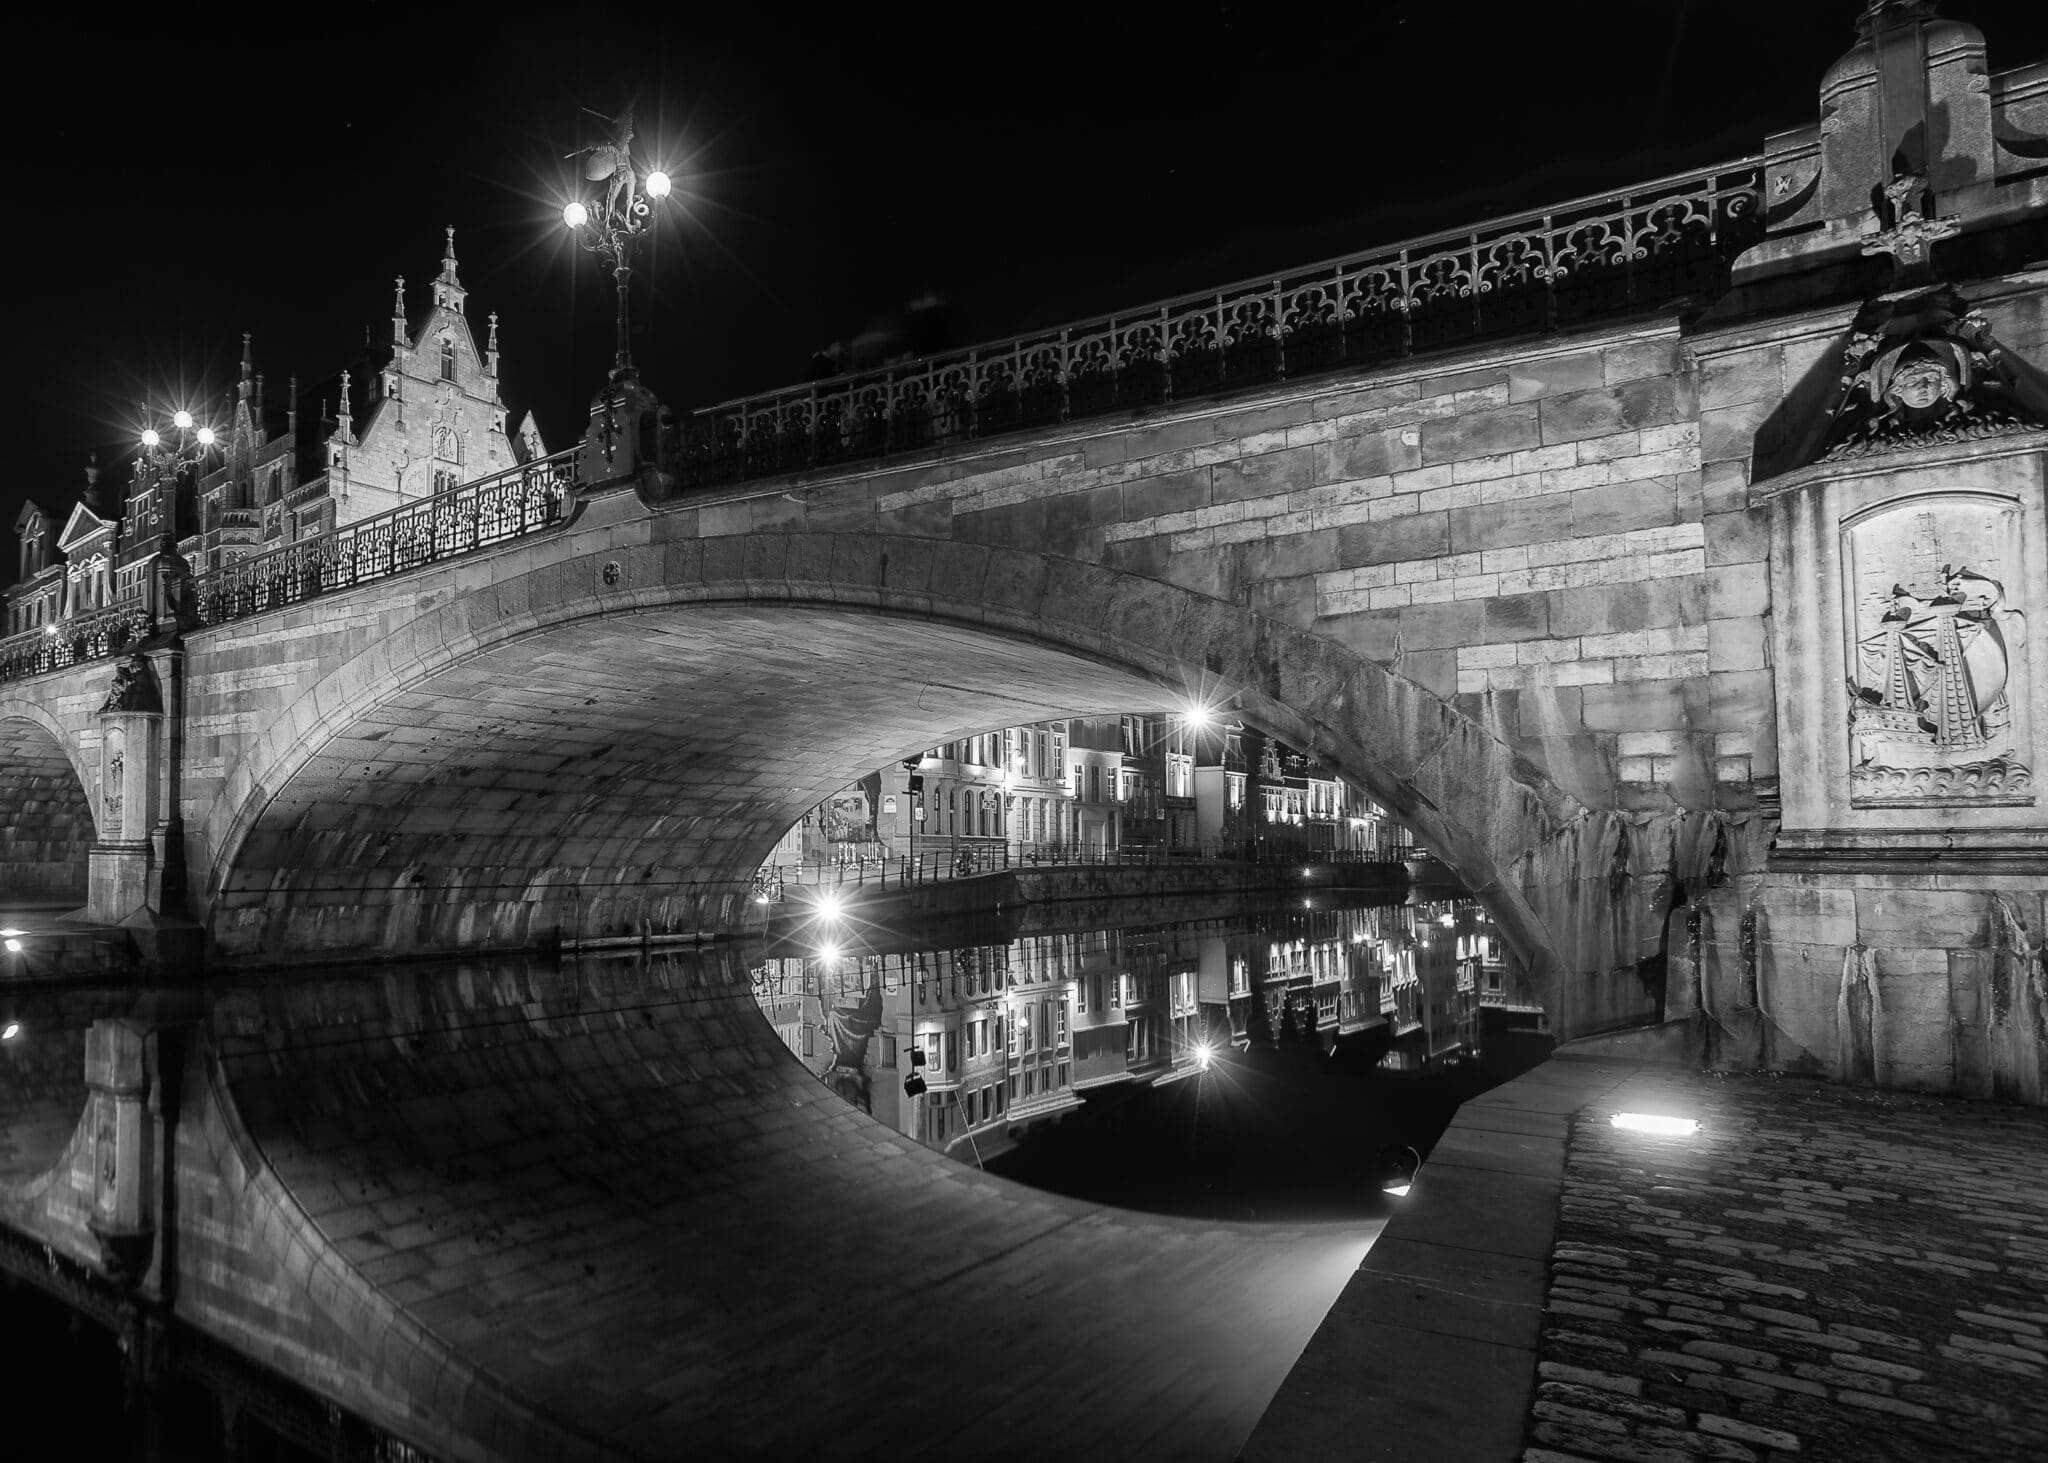 Cityscape - Gent by Night - Saint-Michielsbridge - Fotografie Krist